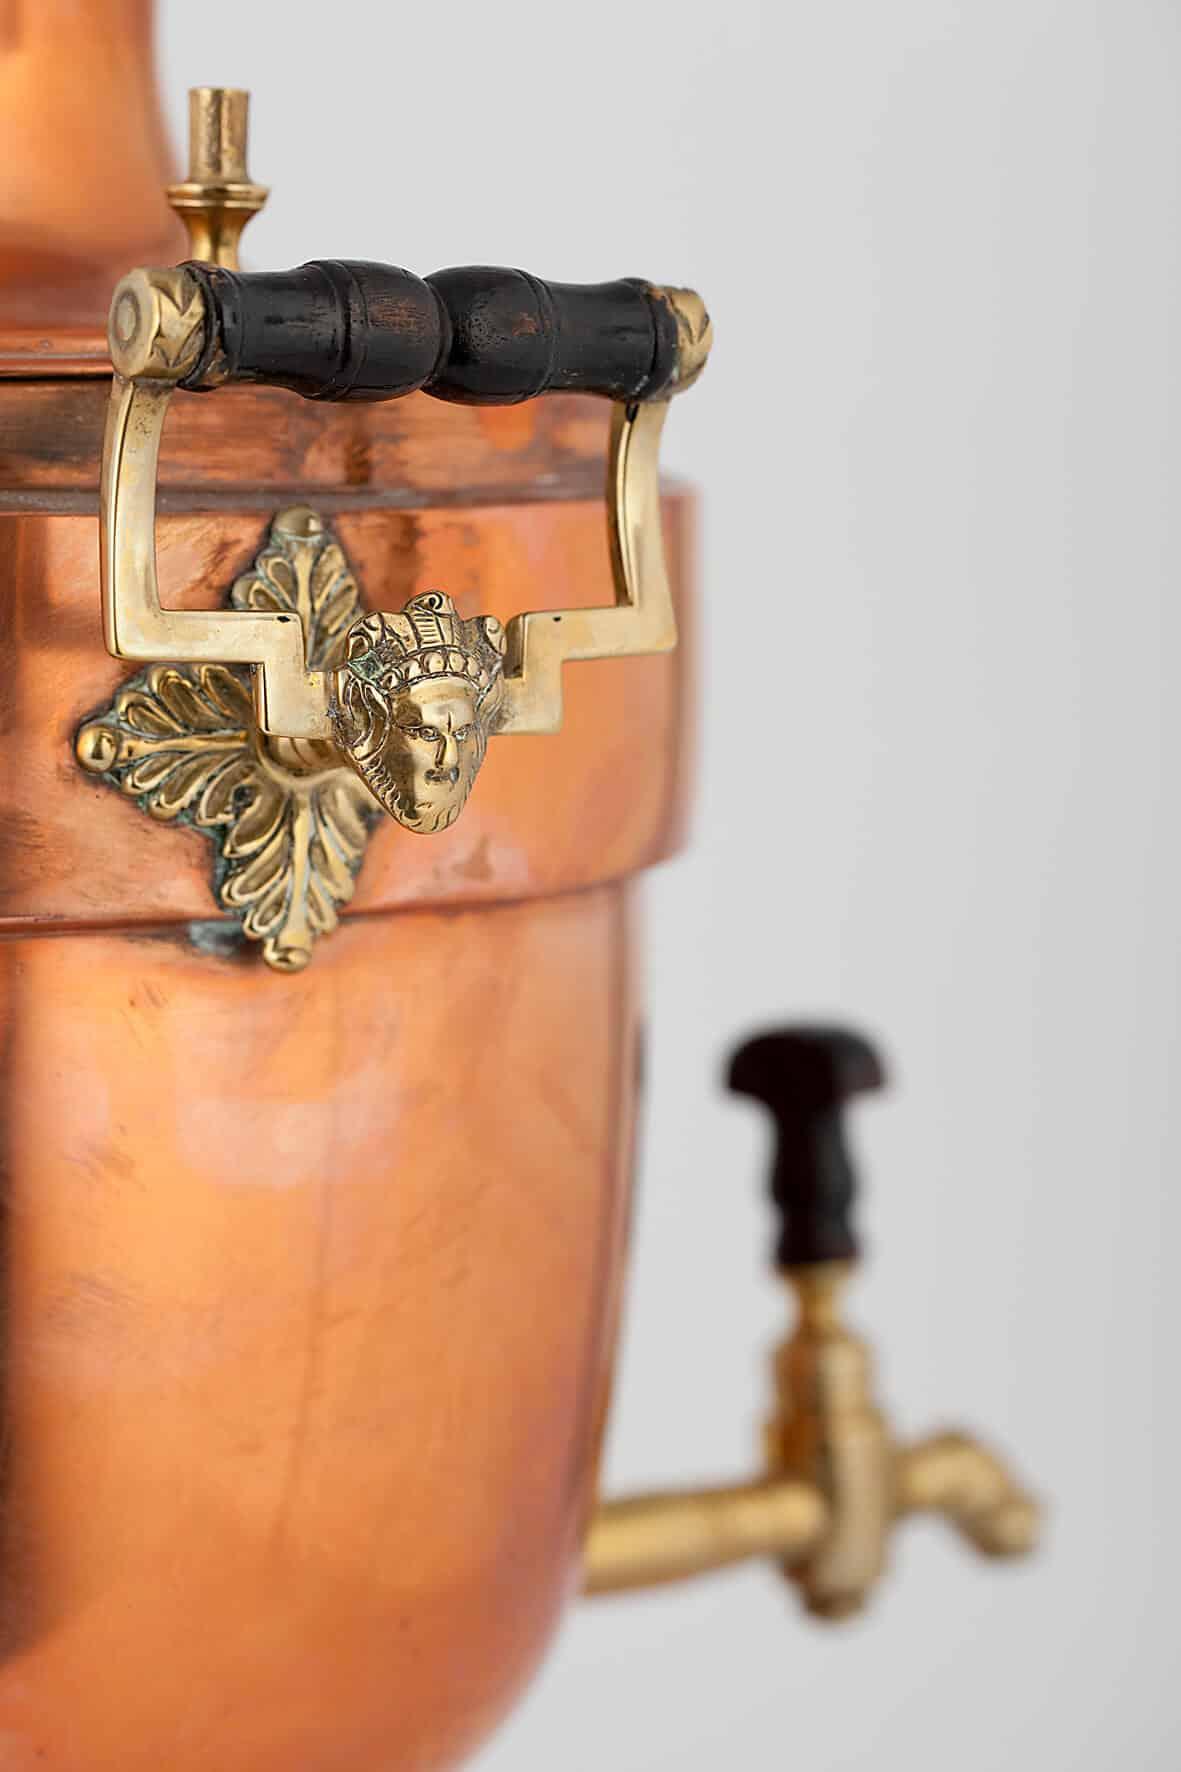 КБ 420 | Самовар-ваза «Ампир» | Музей самоваров и бульоток